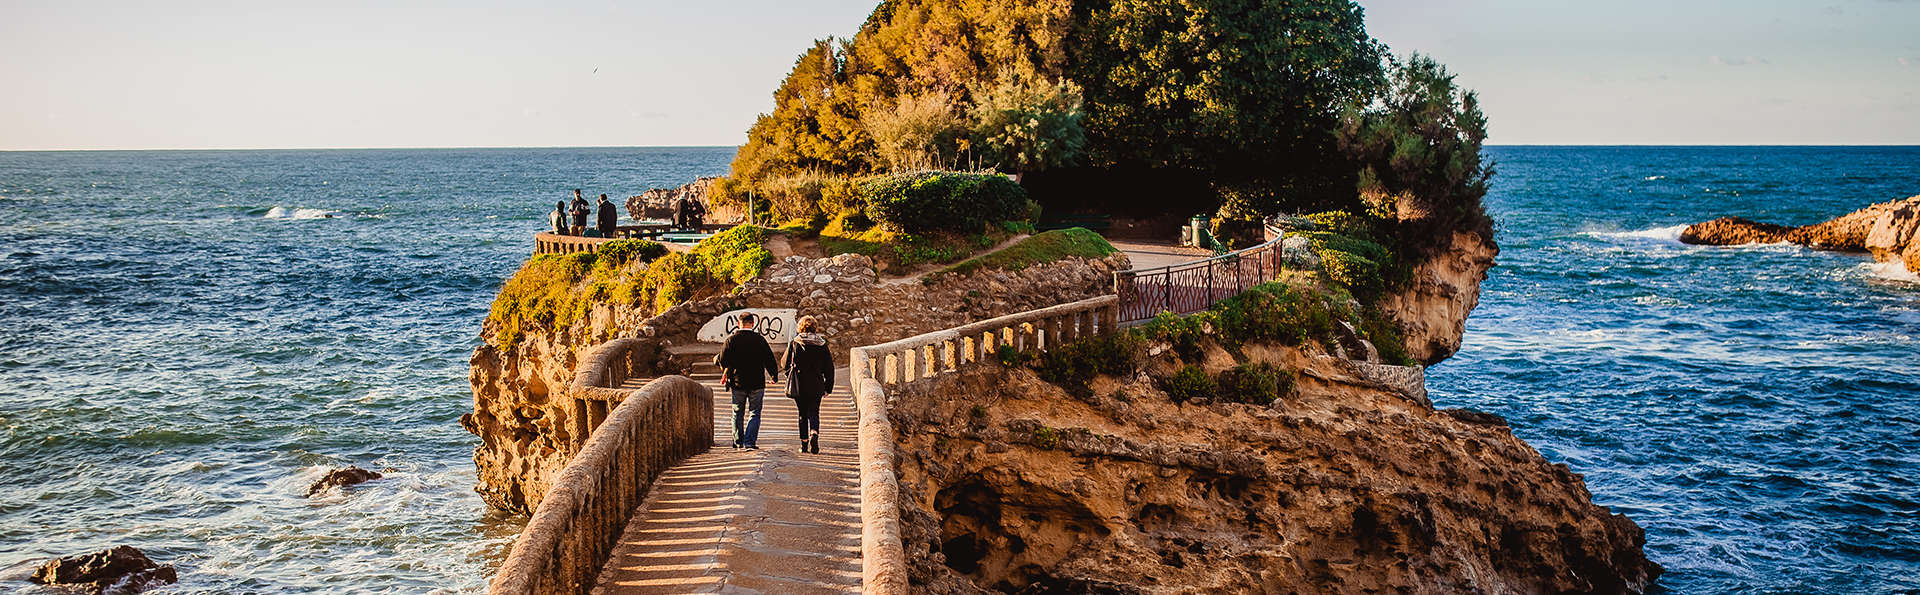 Brise maritime au cœur de Biarritz